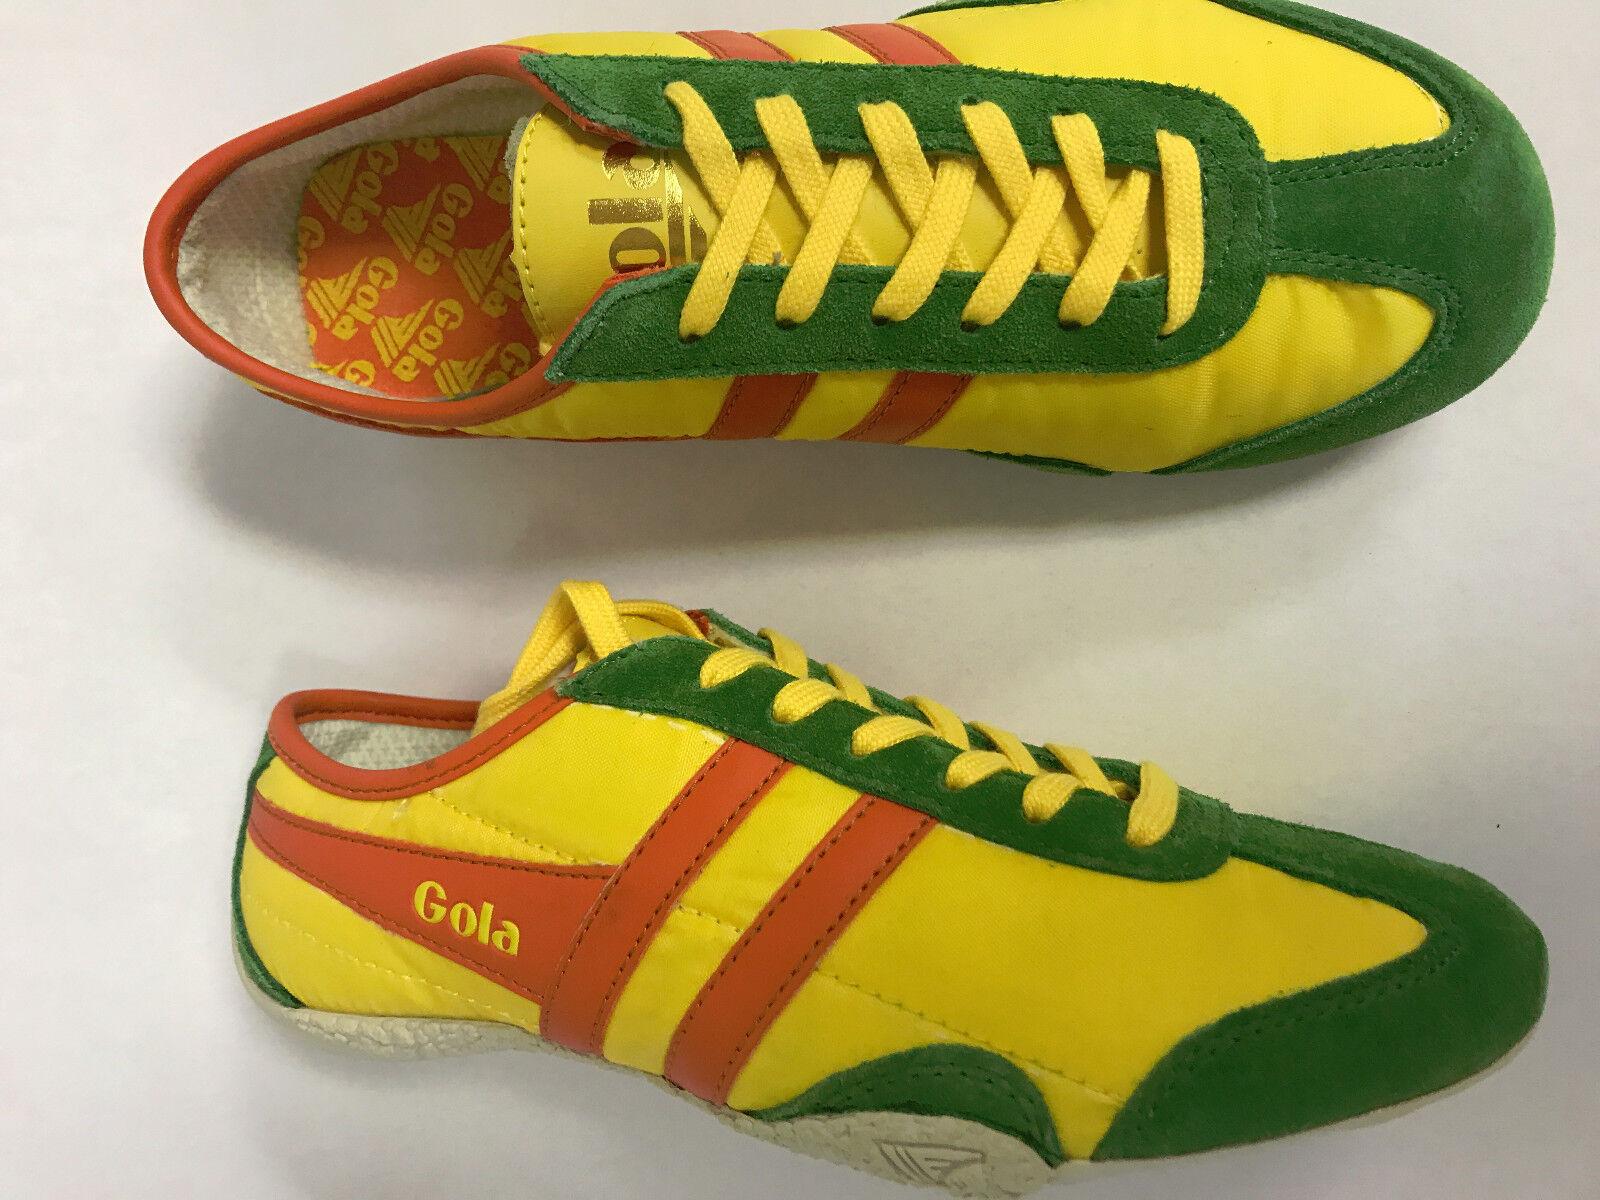 NEW Gola Capital Women`s Sneaker New. Size 5 U.s